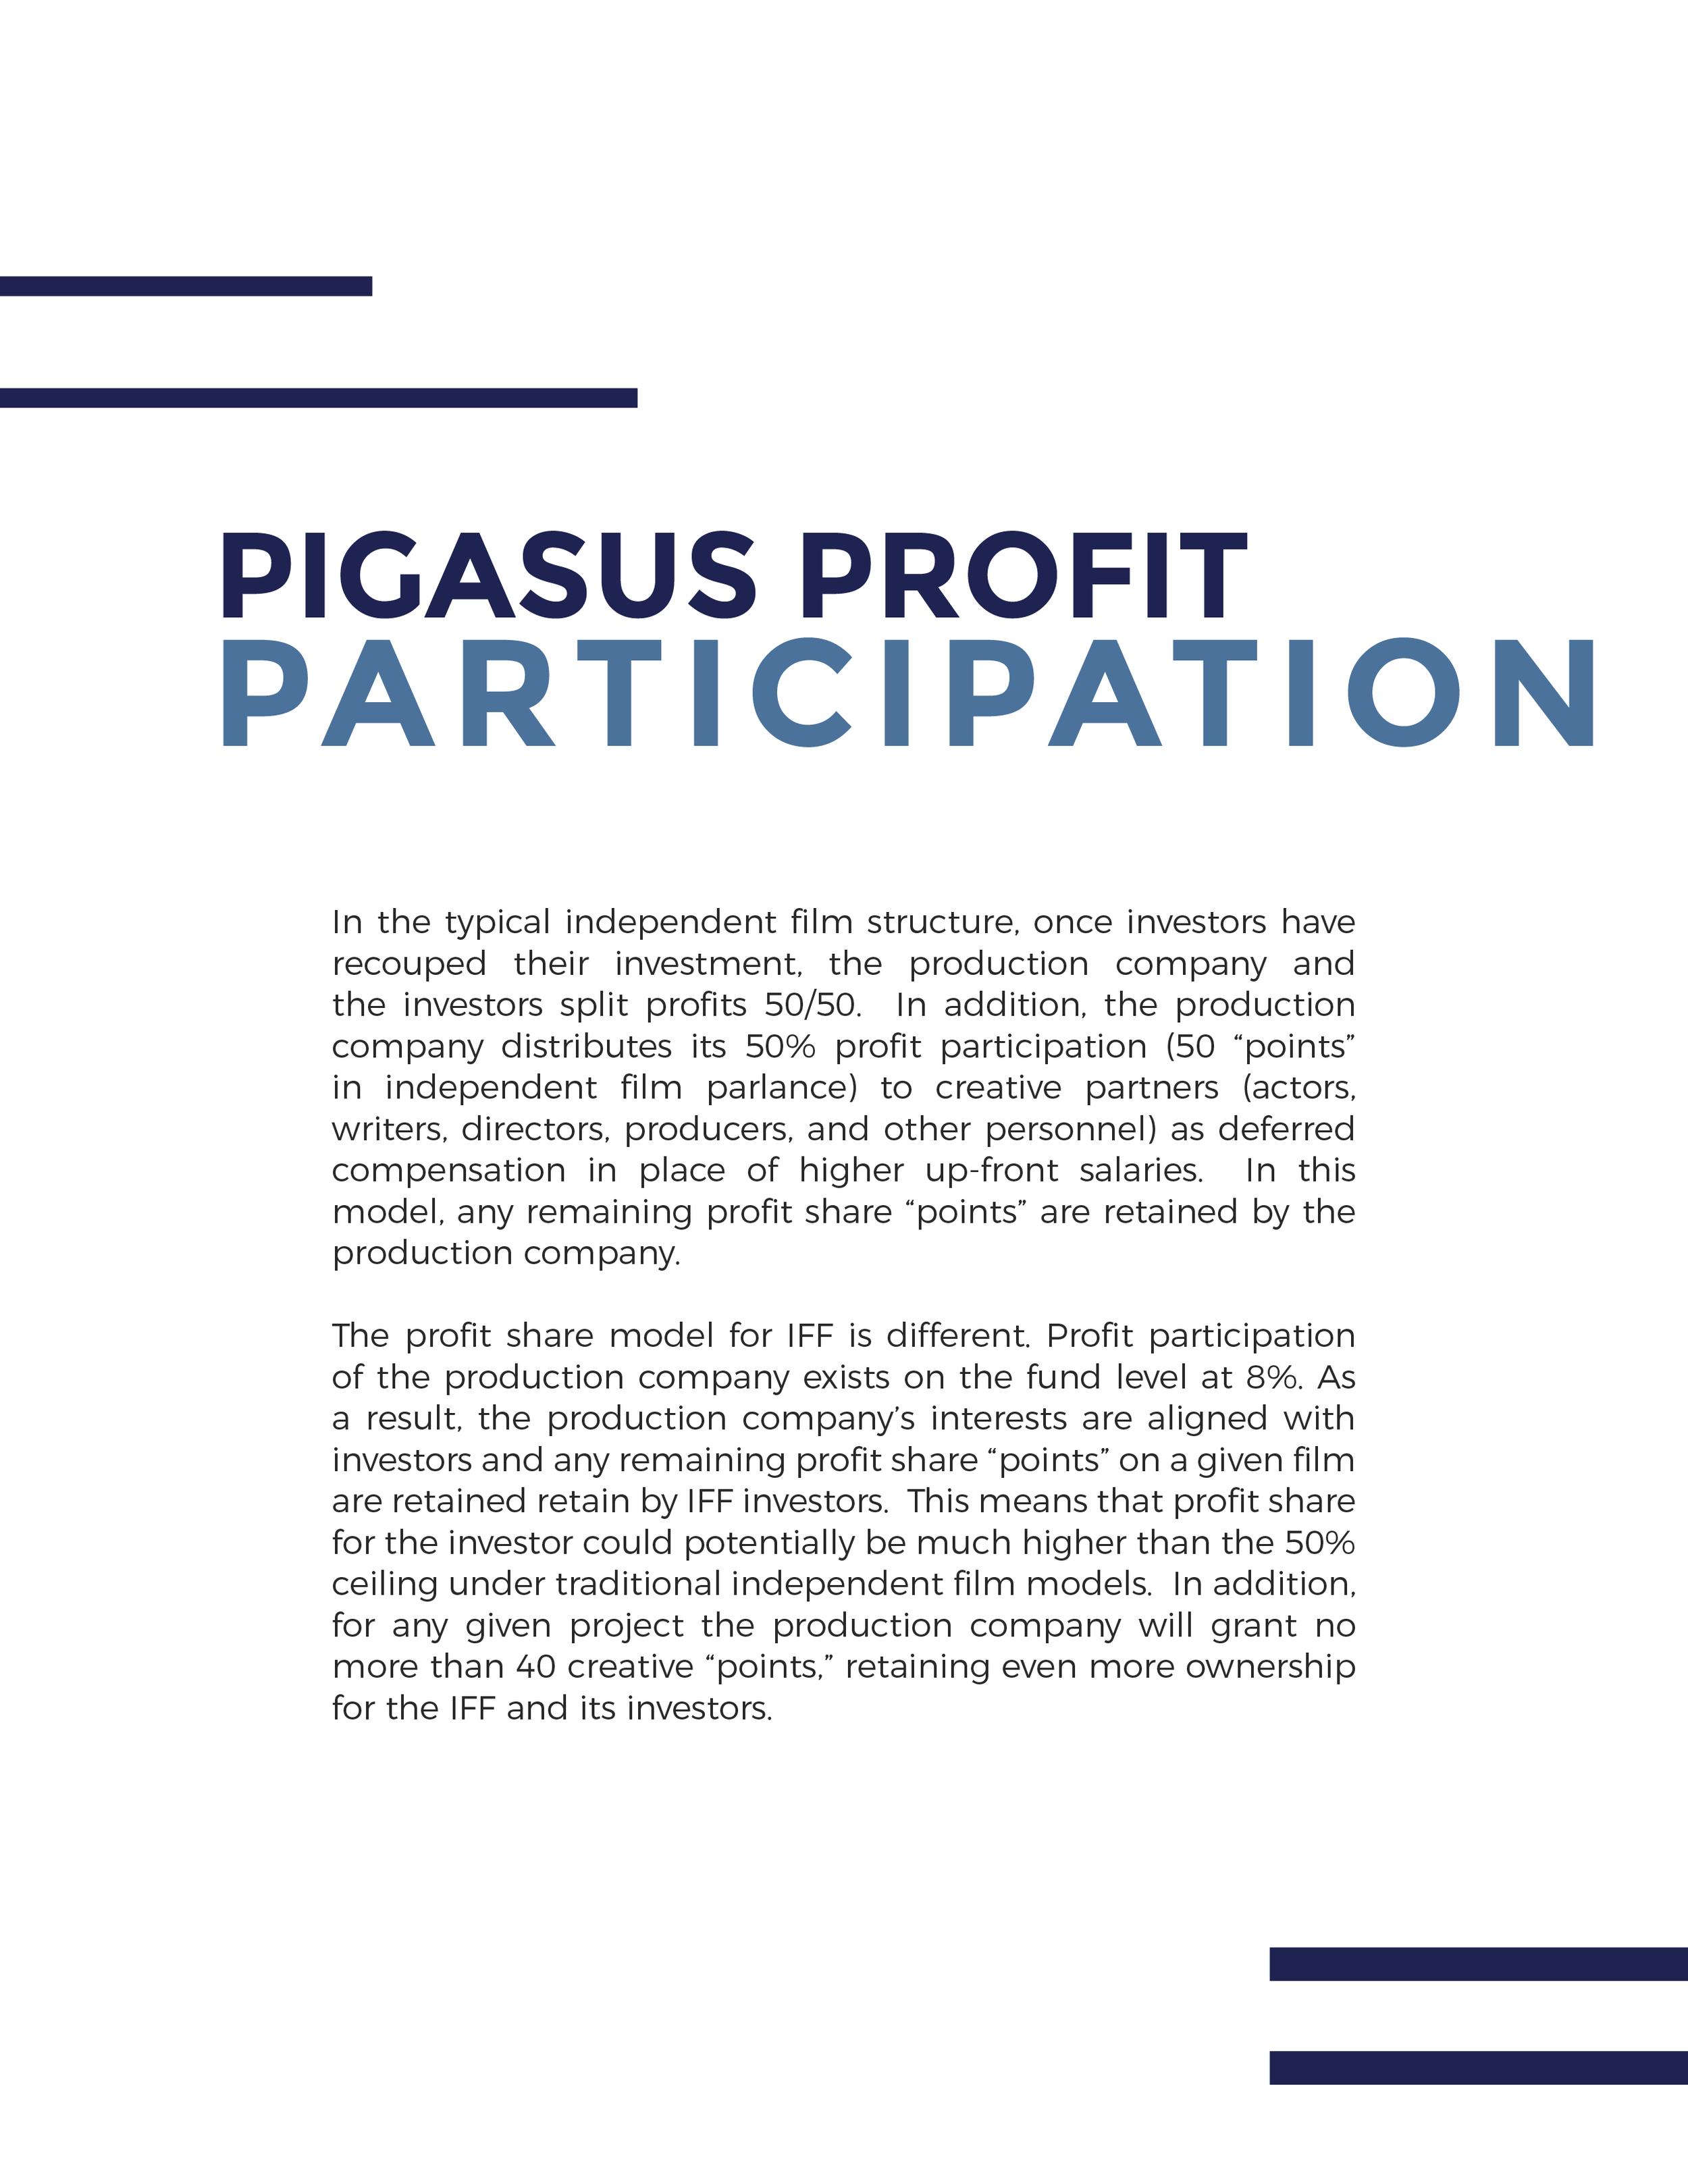 Pigasus Indiana Film Fund Deck16.png